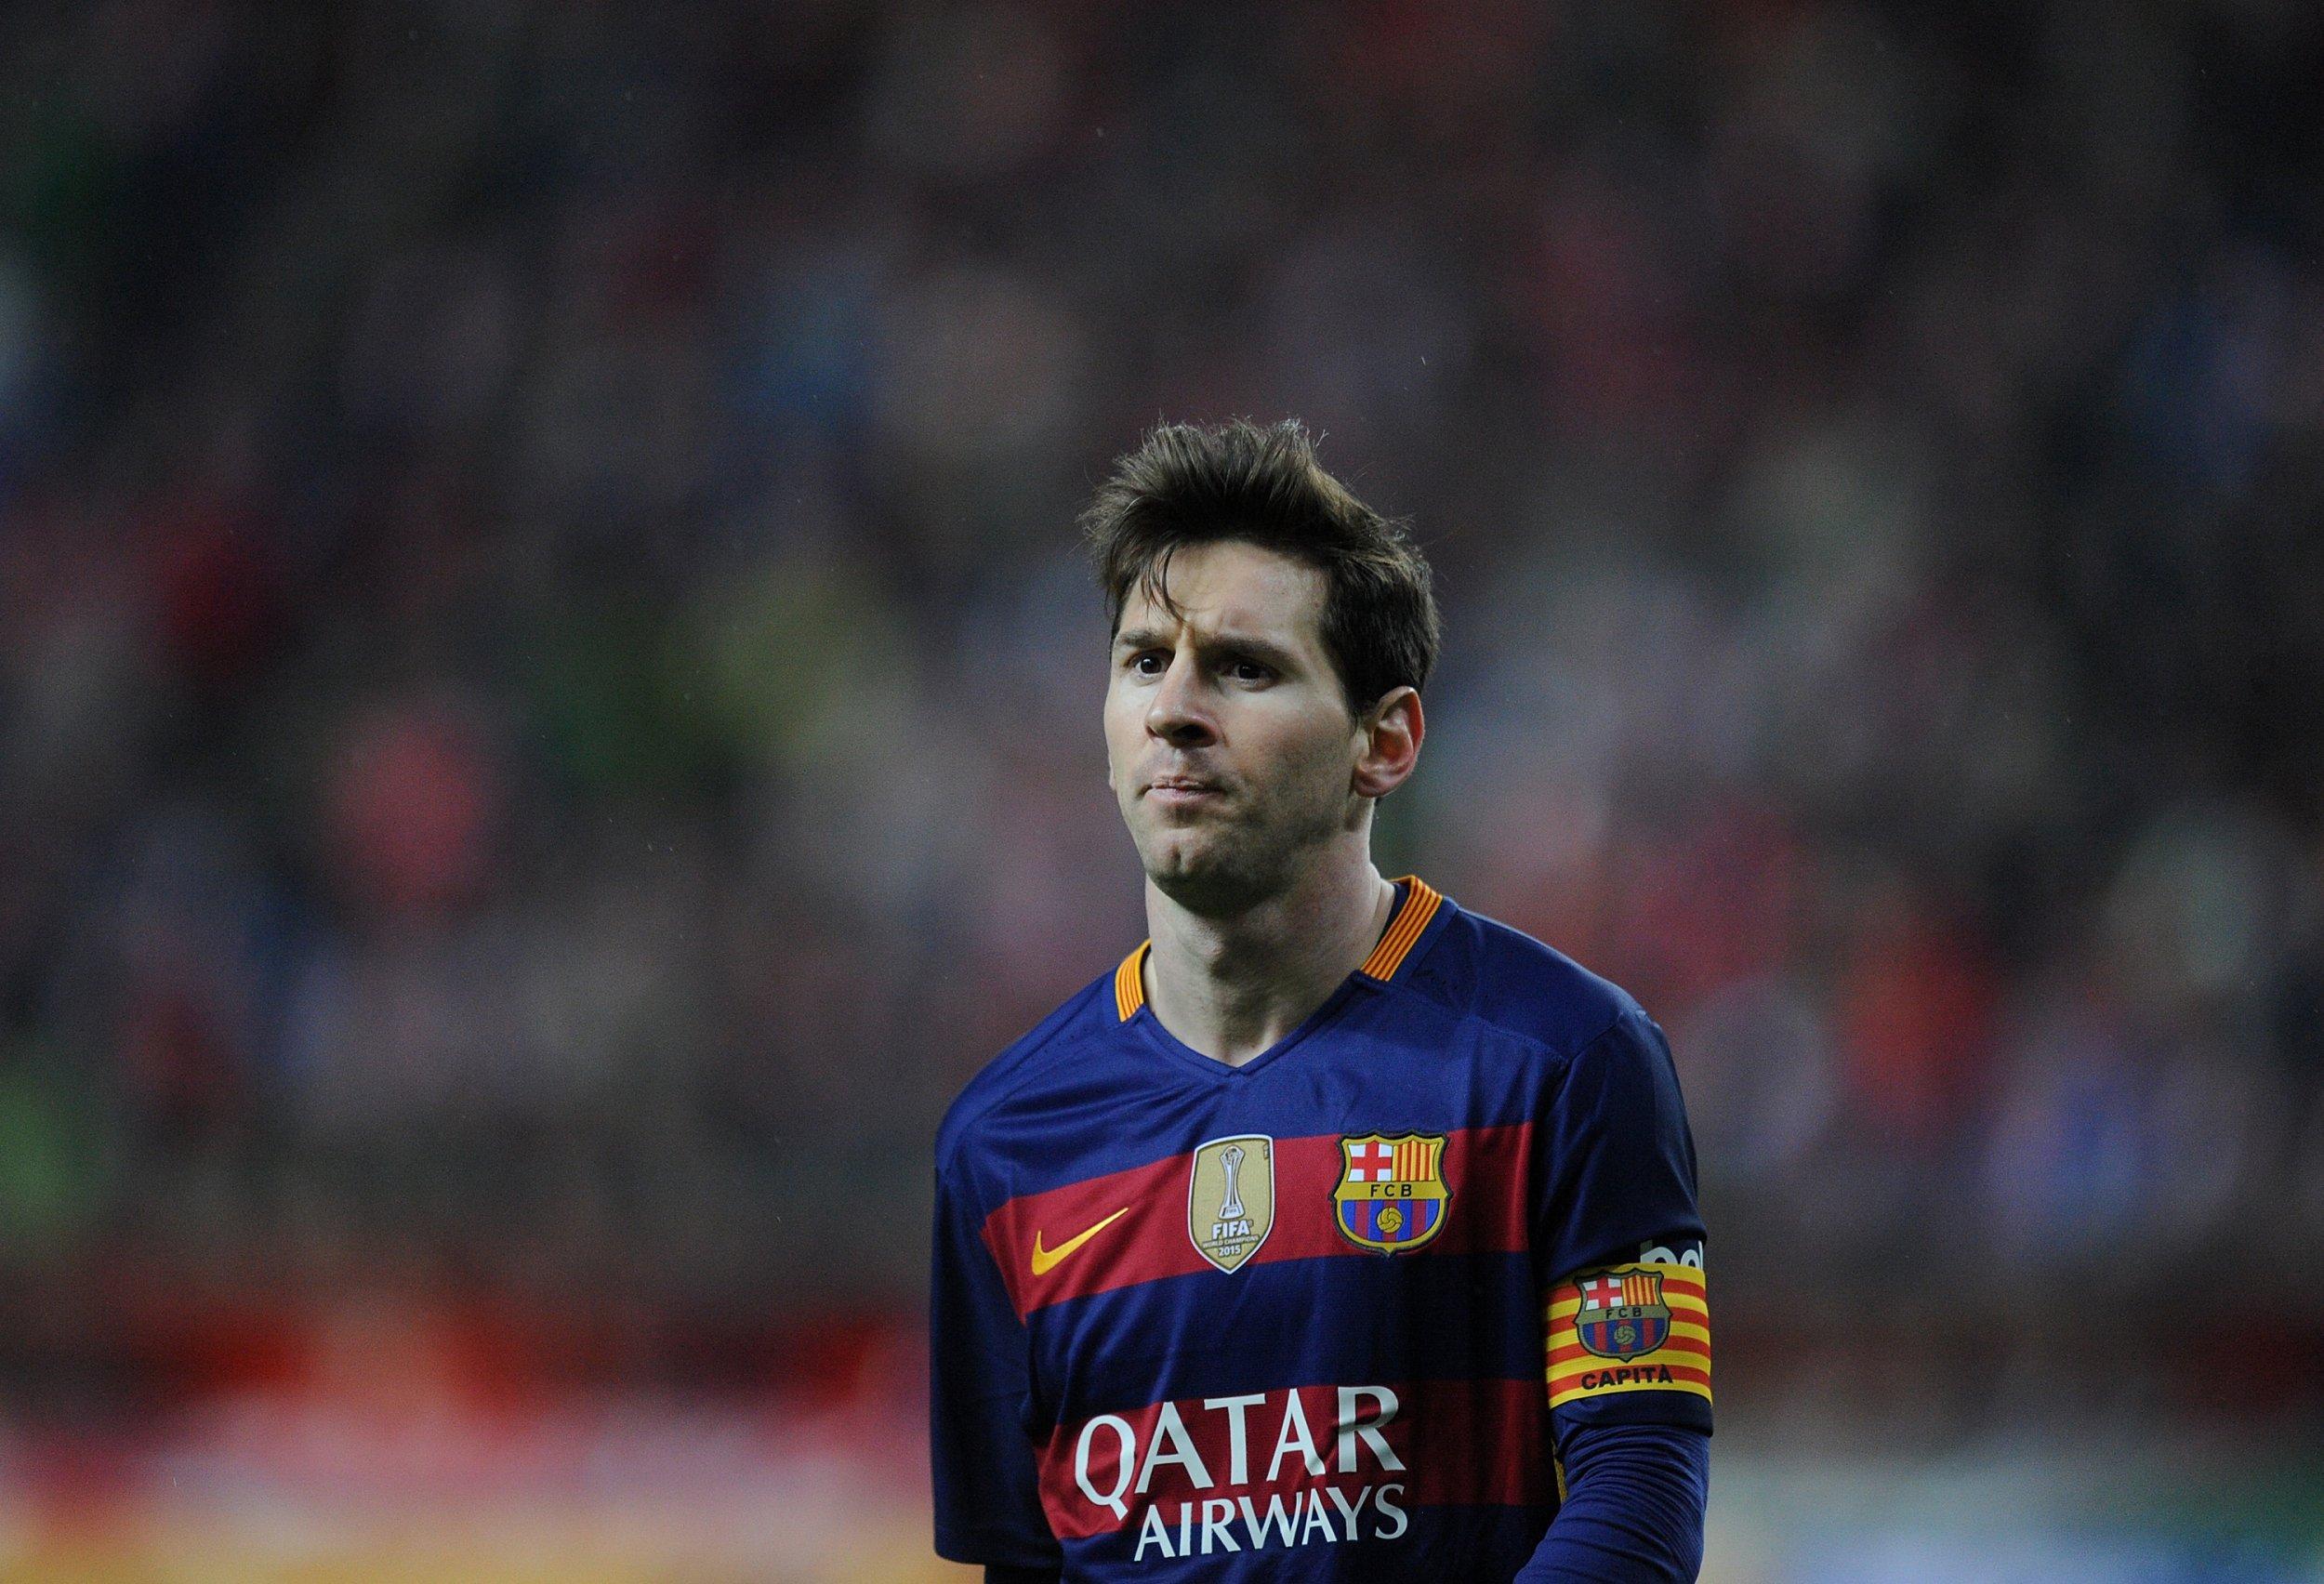 Cute Tech Wallpaper Barcelona S Lionel Messi Is Surpassing Pele Diego